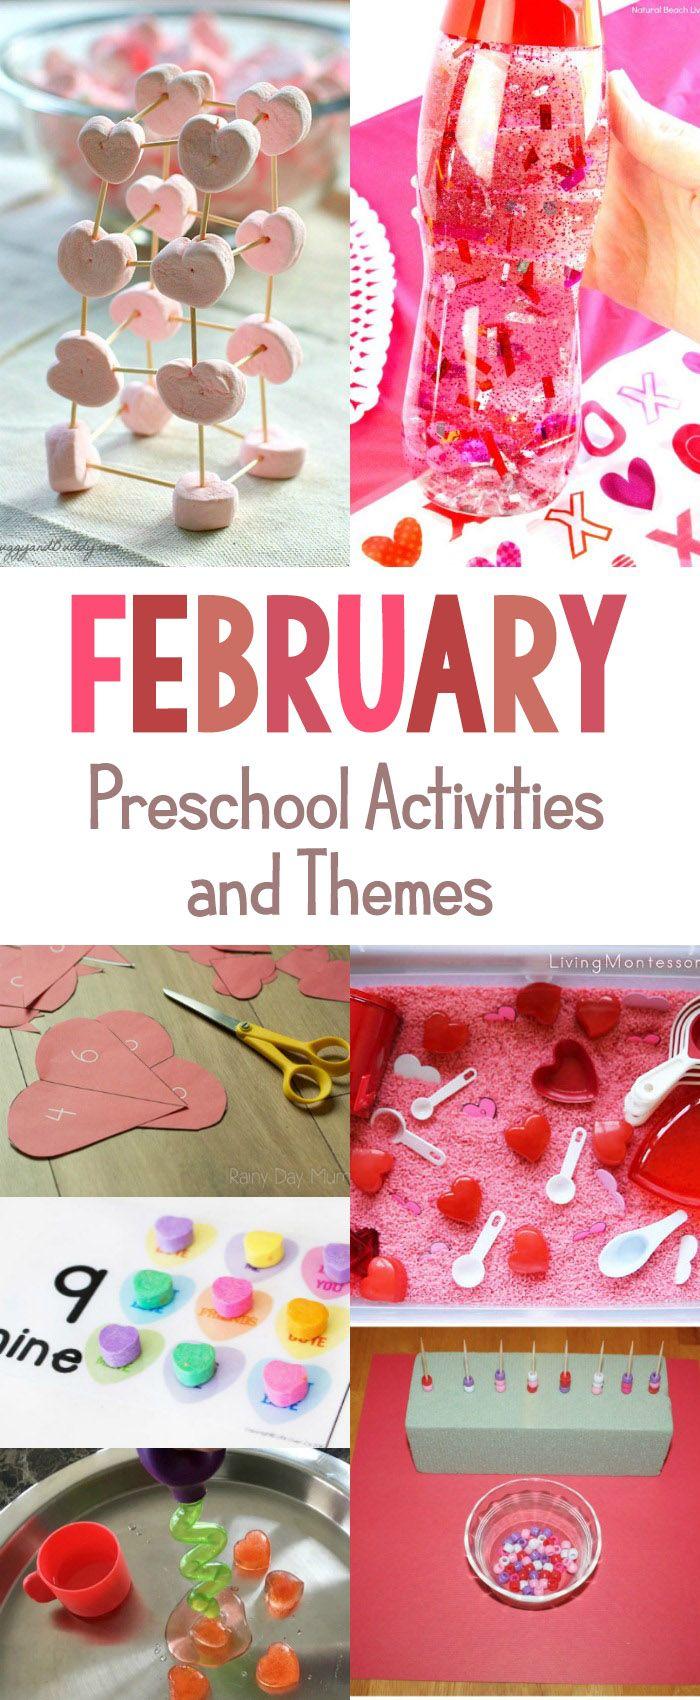 30  february preschool activities and themes for preschool